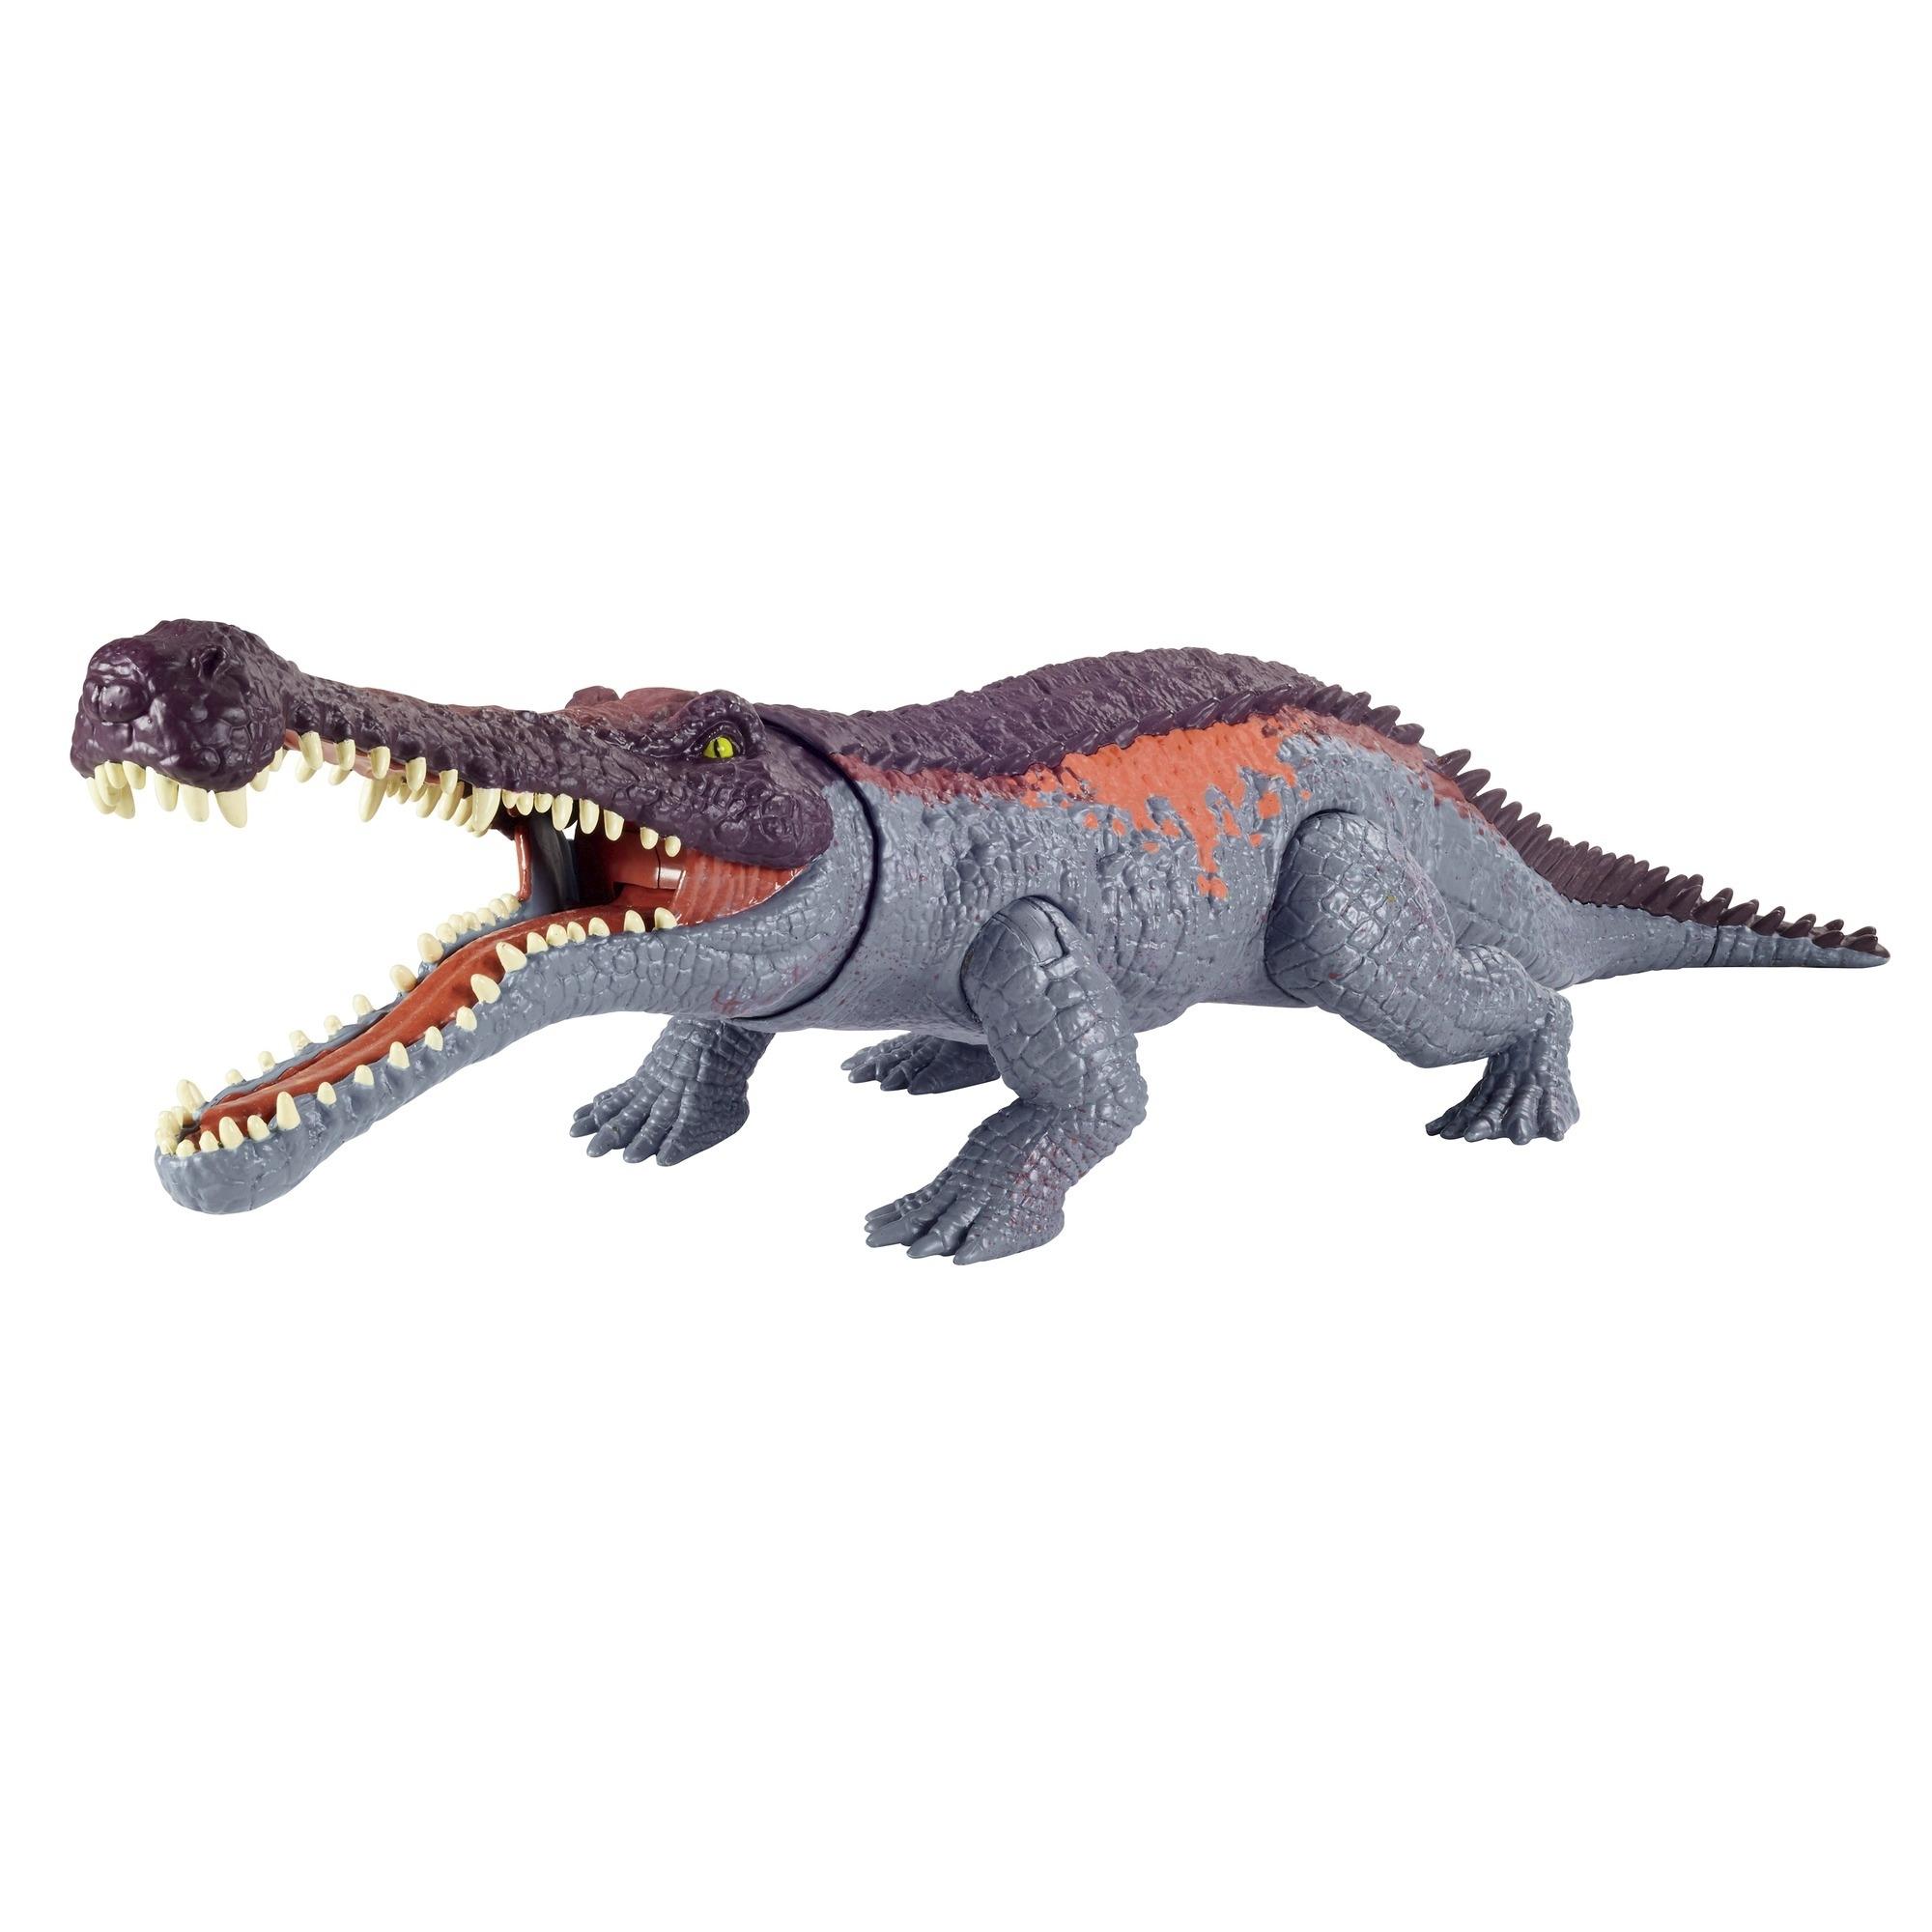 Jurassic World: Mega szczęki - Sarkozuch (GJP32/GVG68)